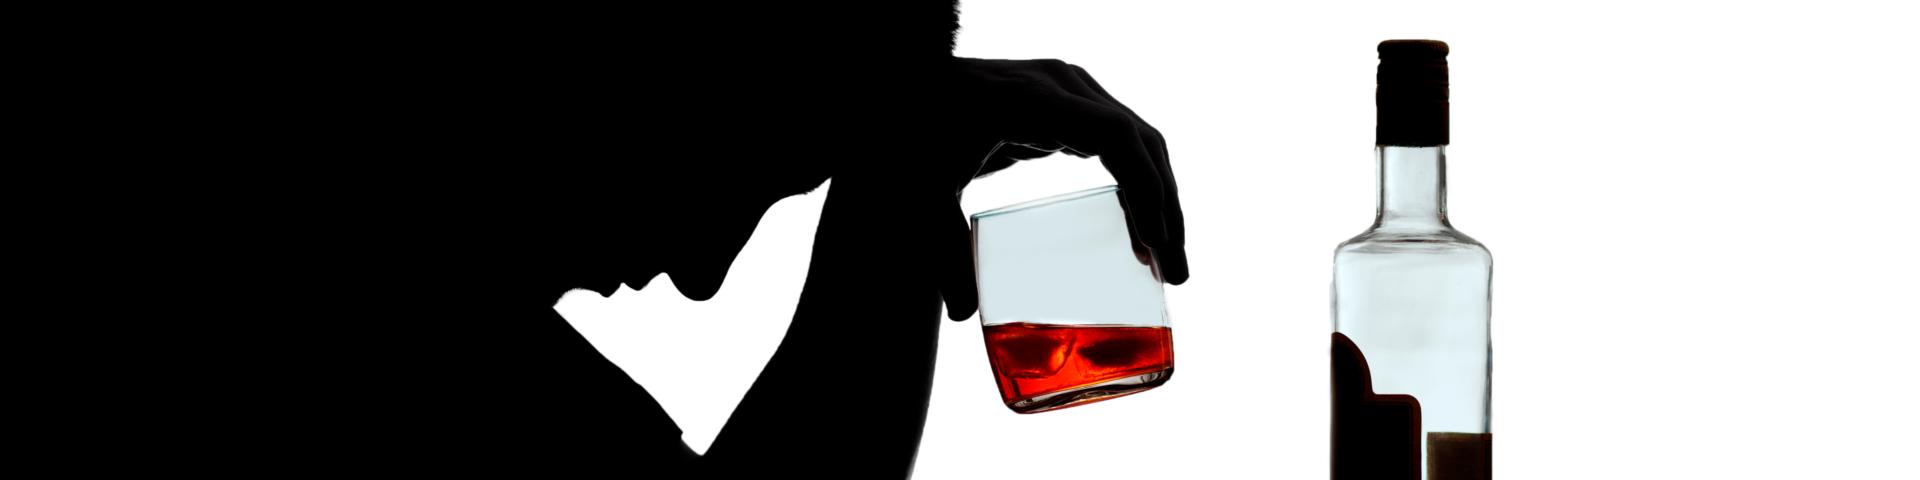 alcoholism as a deadly disease